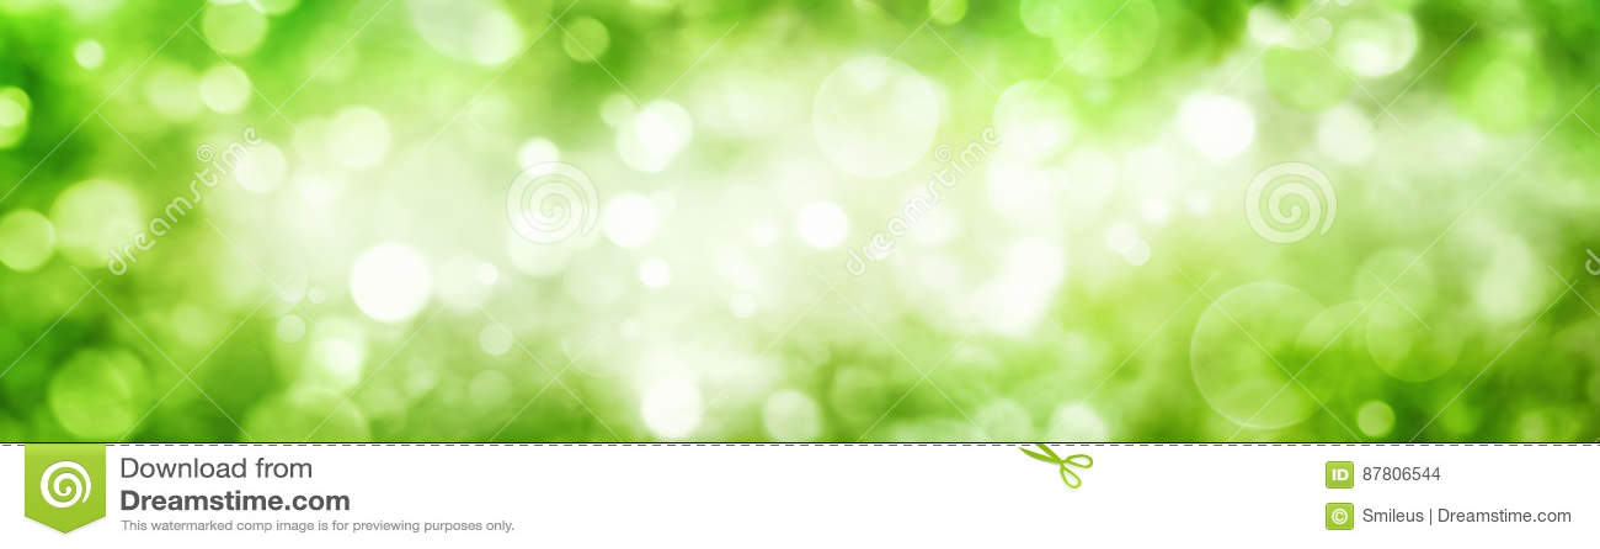 Bokeh vert de feuillage avec miroiter des points culminants